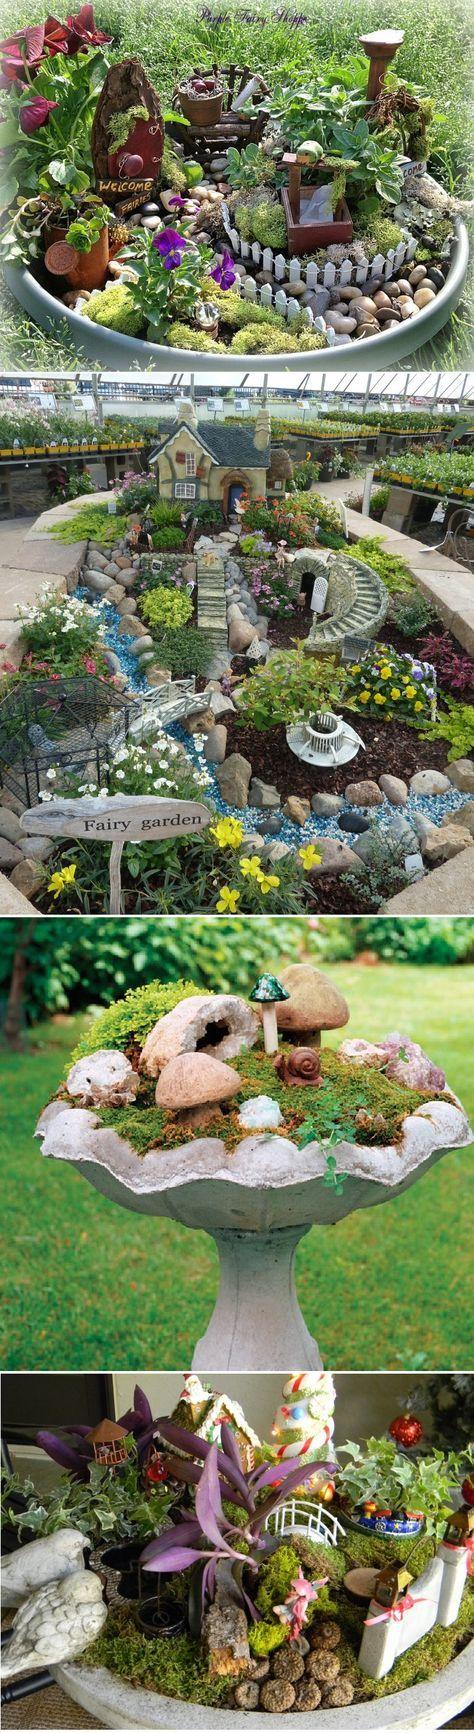 Beautiful DIY Ideas How To Make Fairy Garden GartenhausBaumstumpfKaktusGartenkunstGarten DekoModellbauGnome